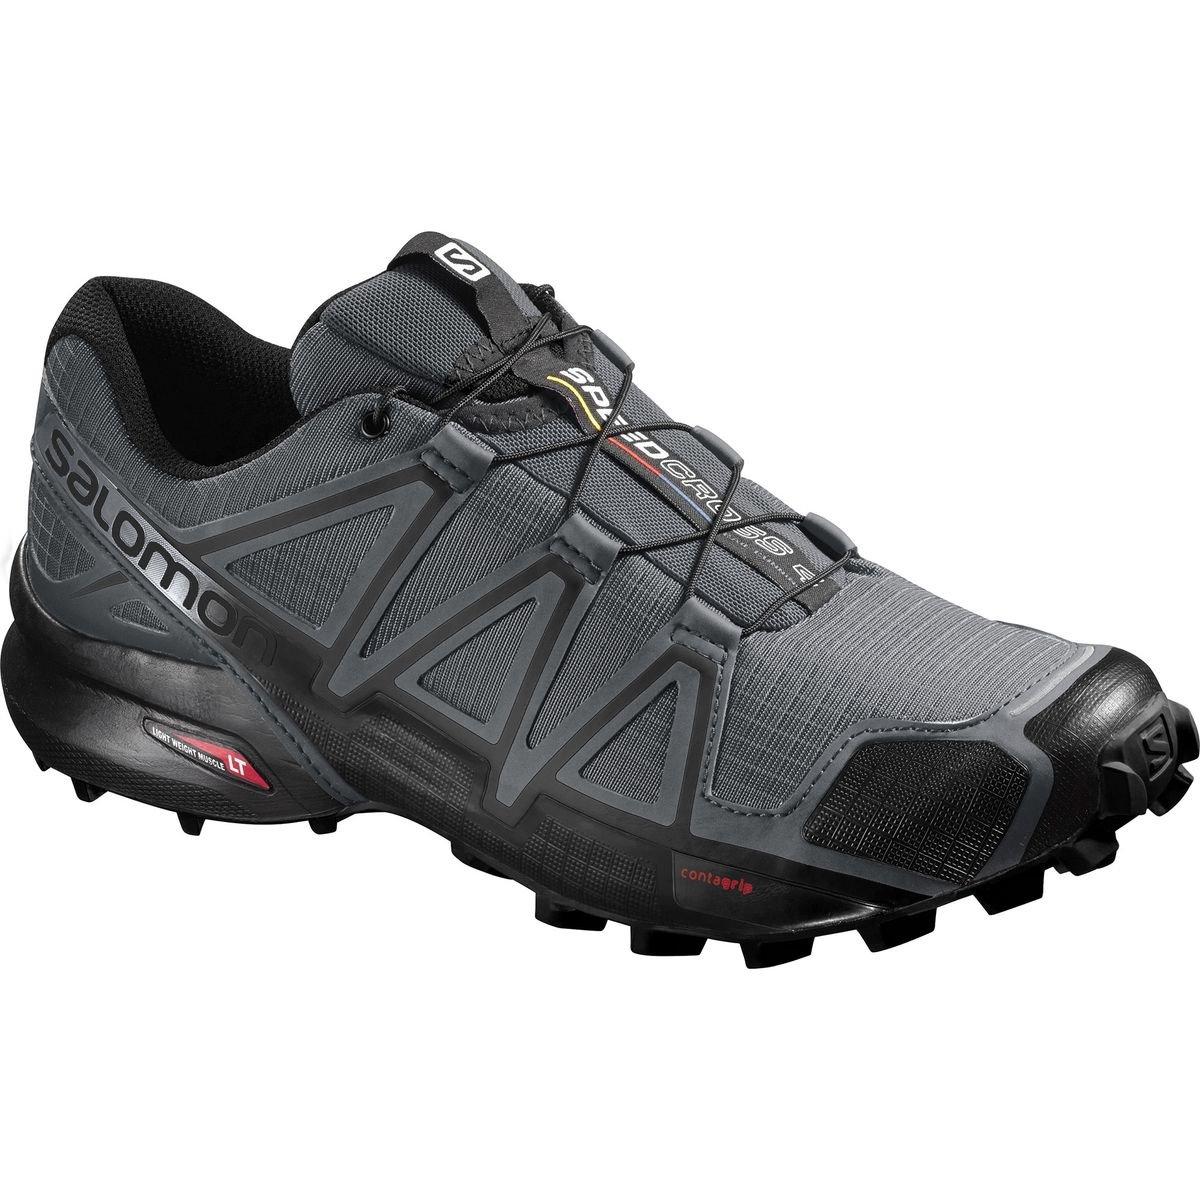 Salomon Speedcross 4 Trail-Running Shoes - Men's (M11, Dark Cloud)